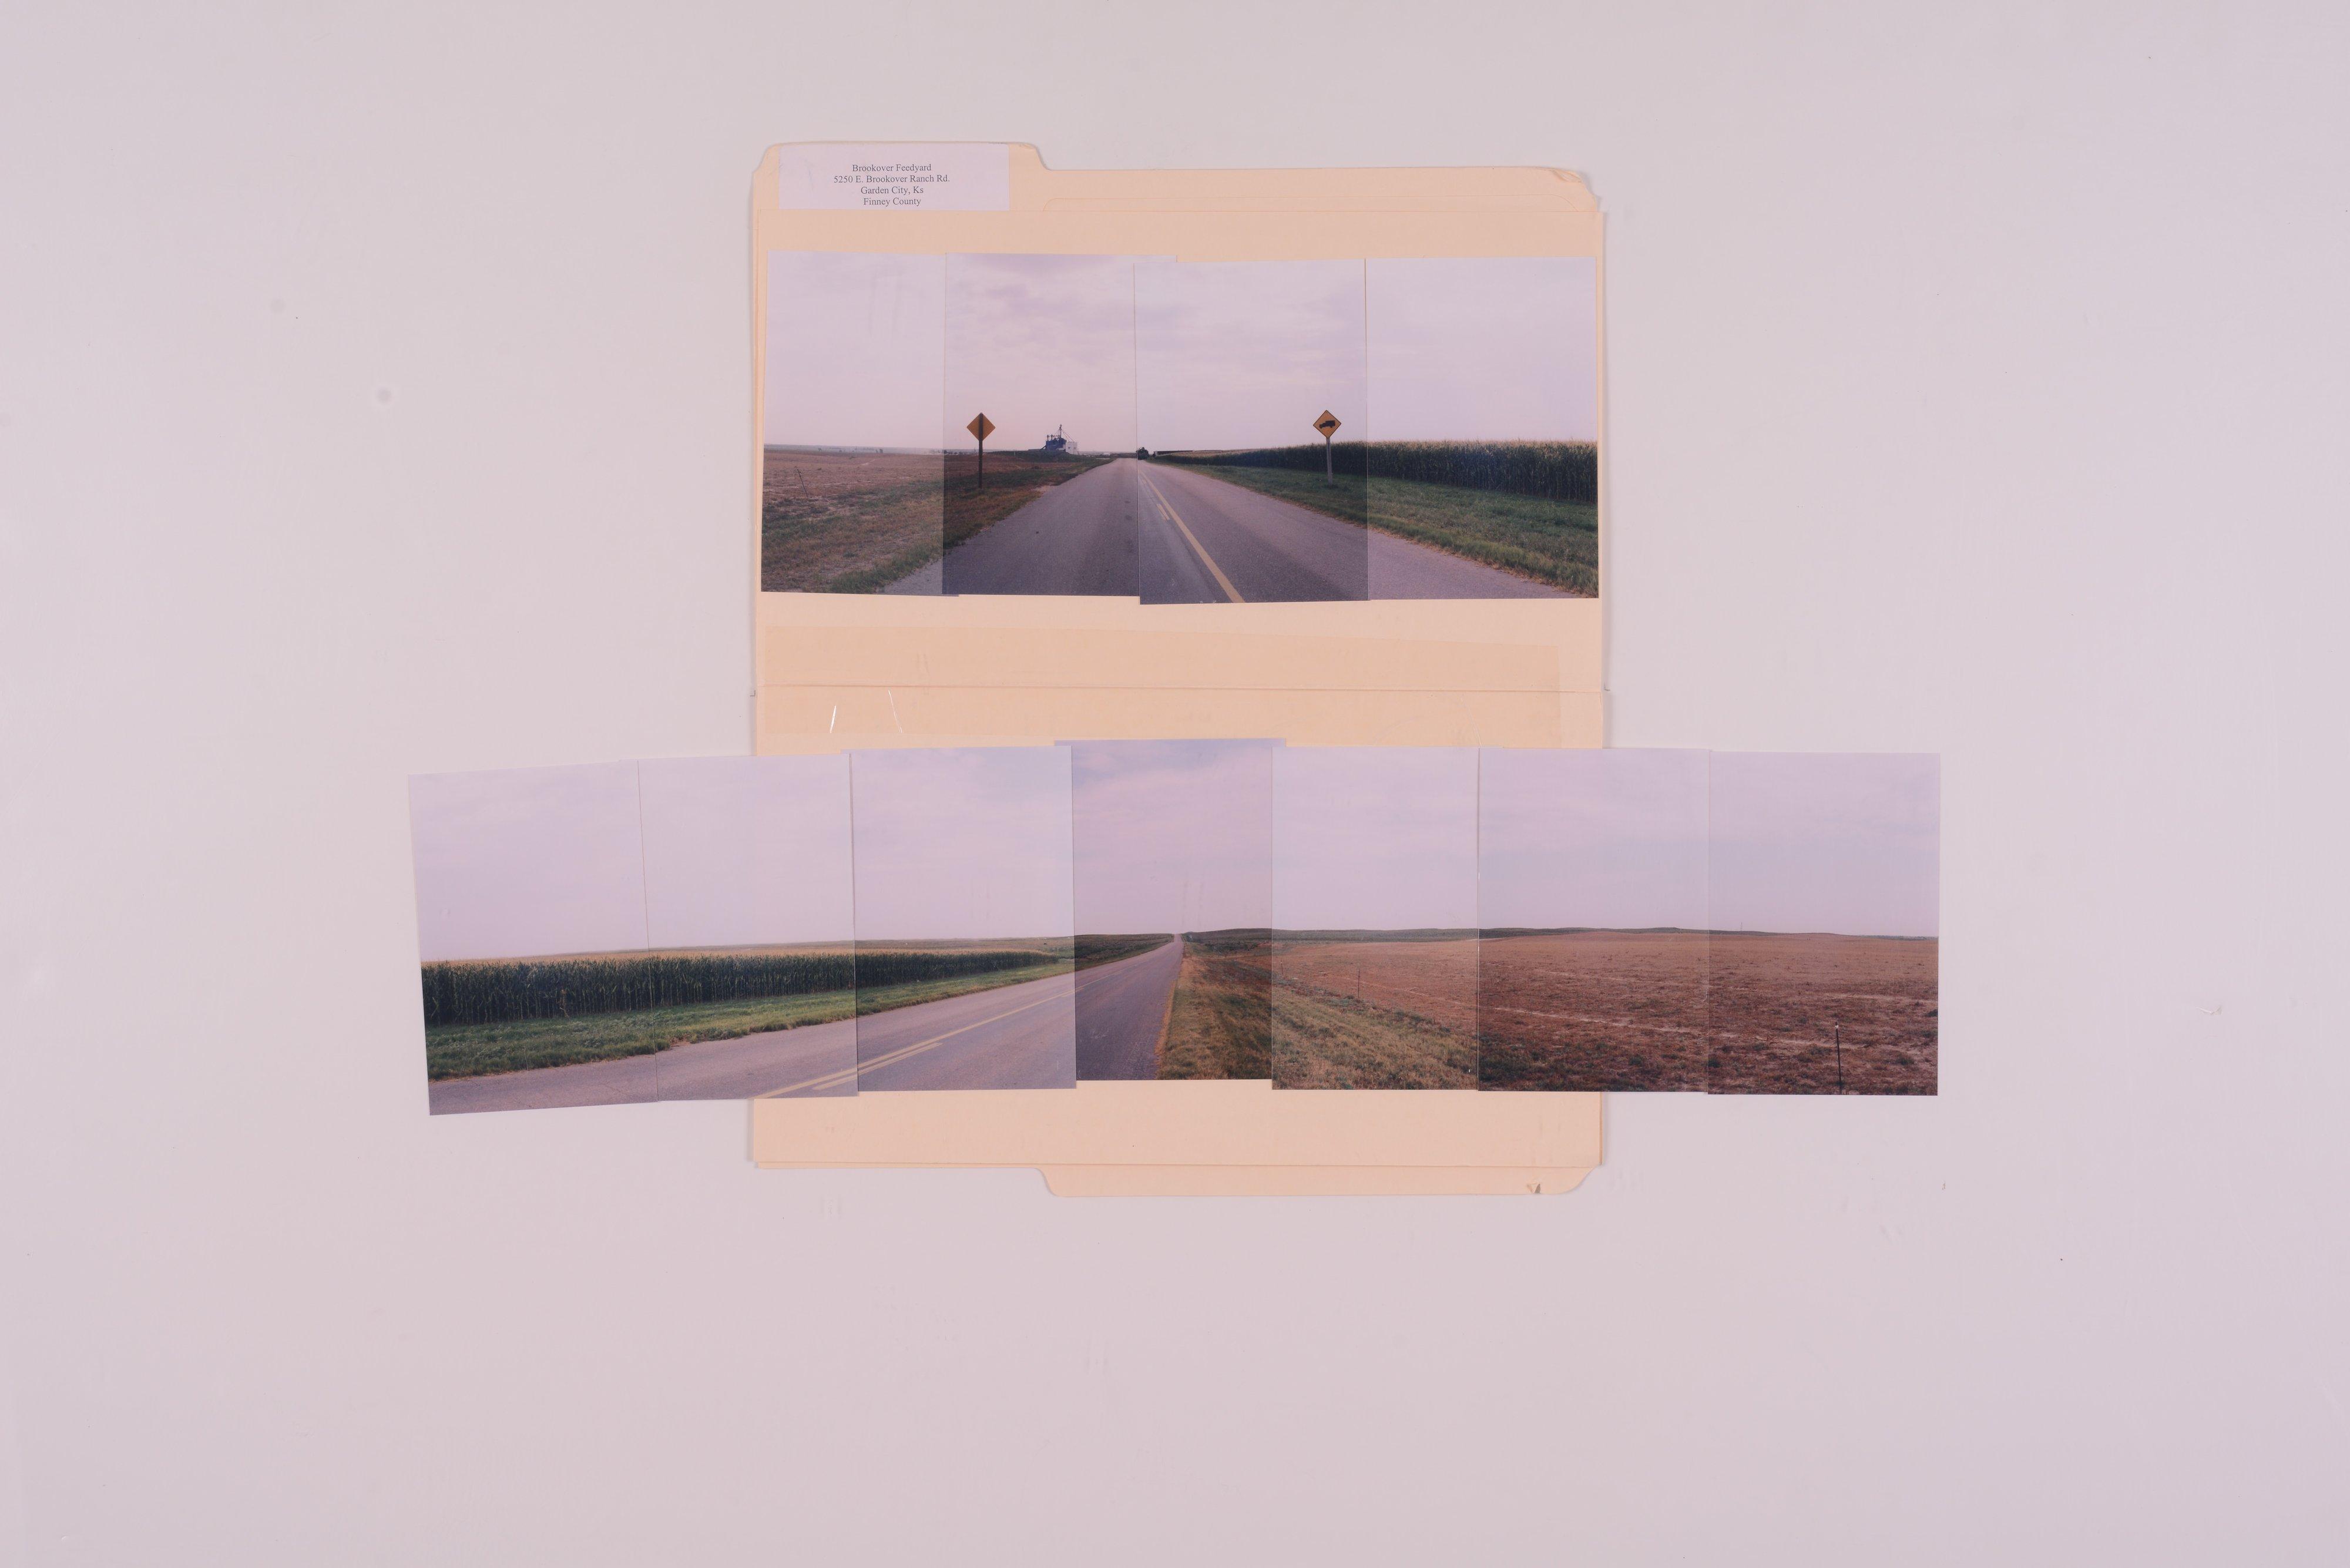 Kansas Film Commission site photographs, subject feedlots - grain elevators - 7